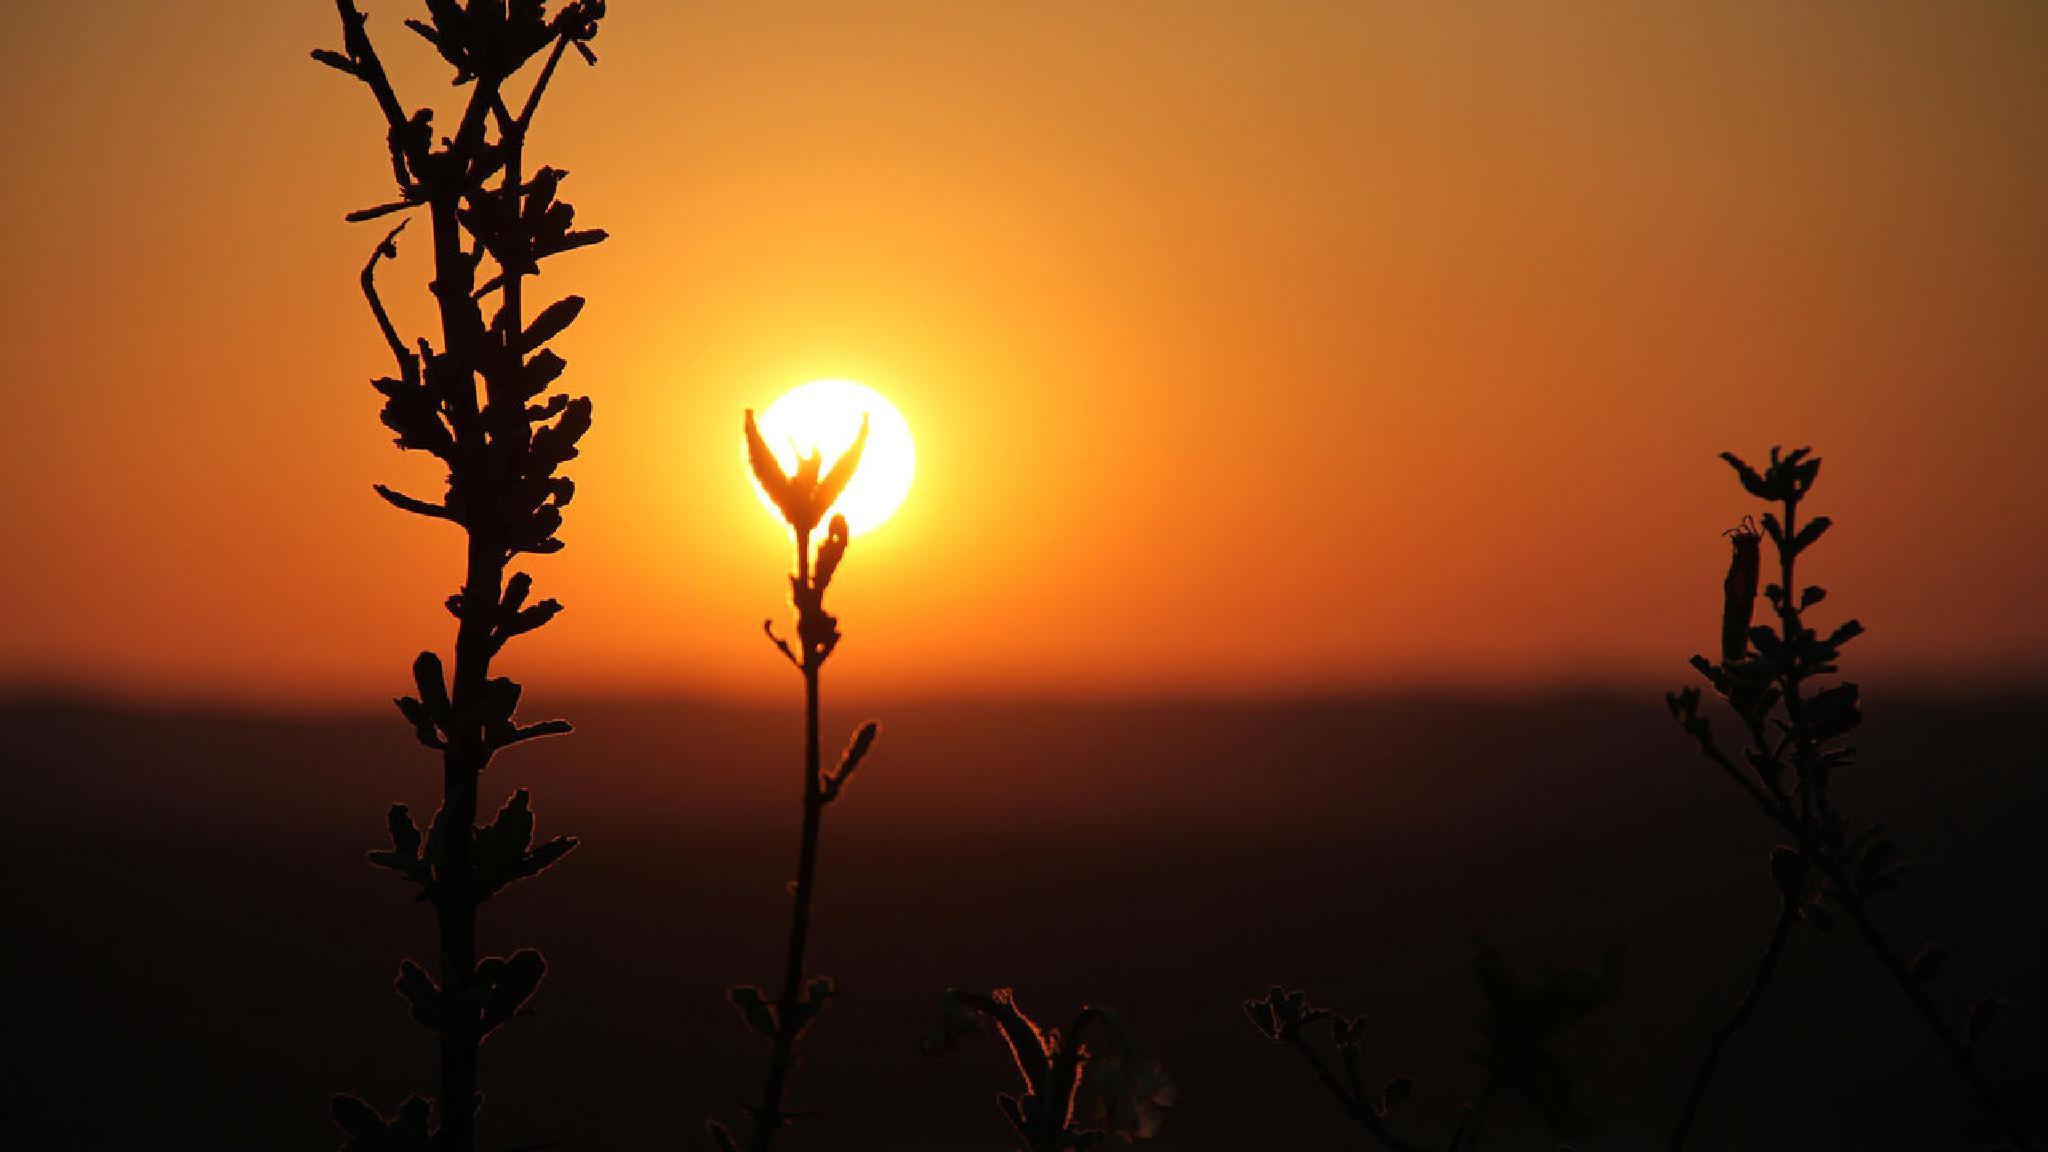 Bushveld Sunset by Nel van Greunen